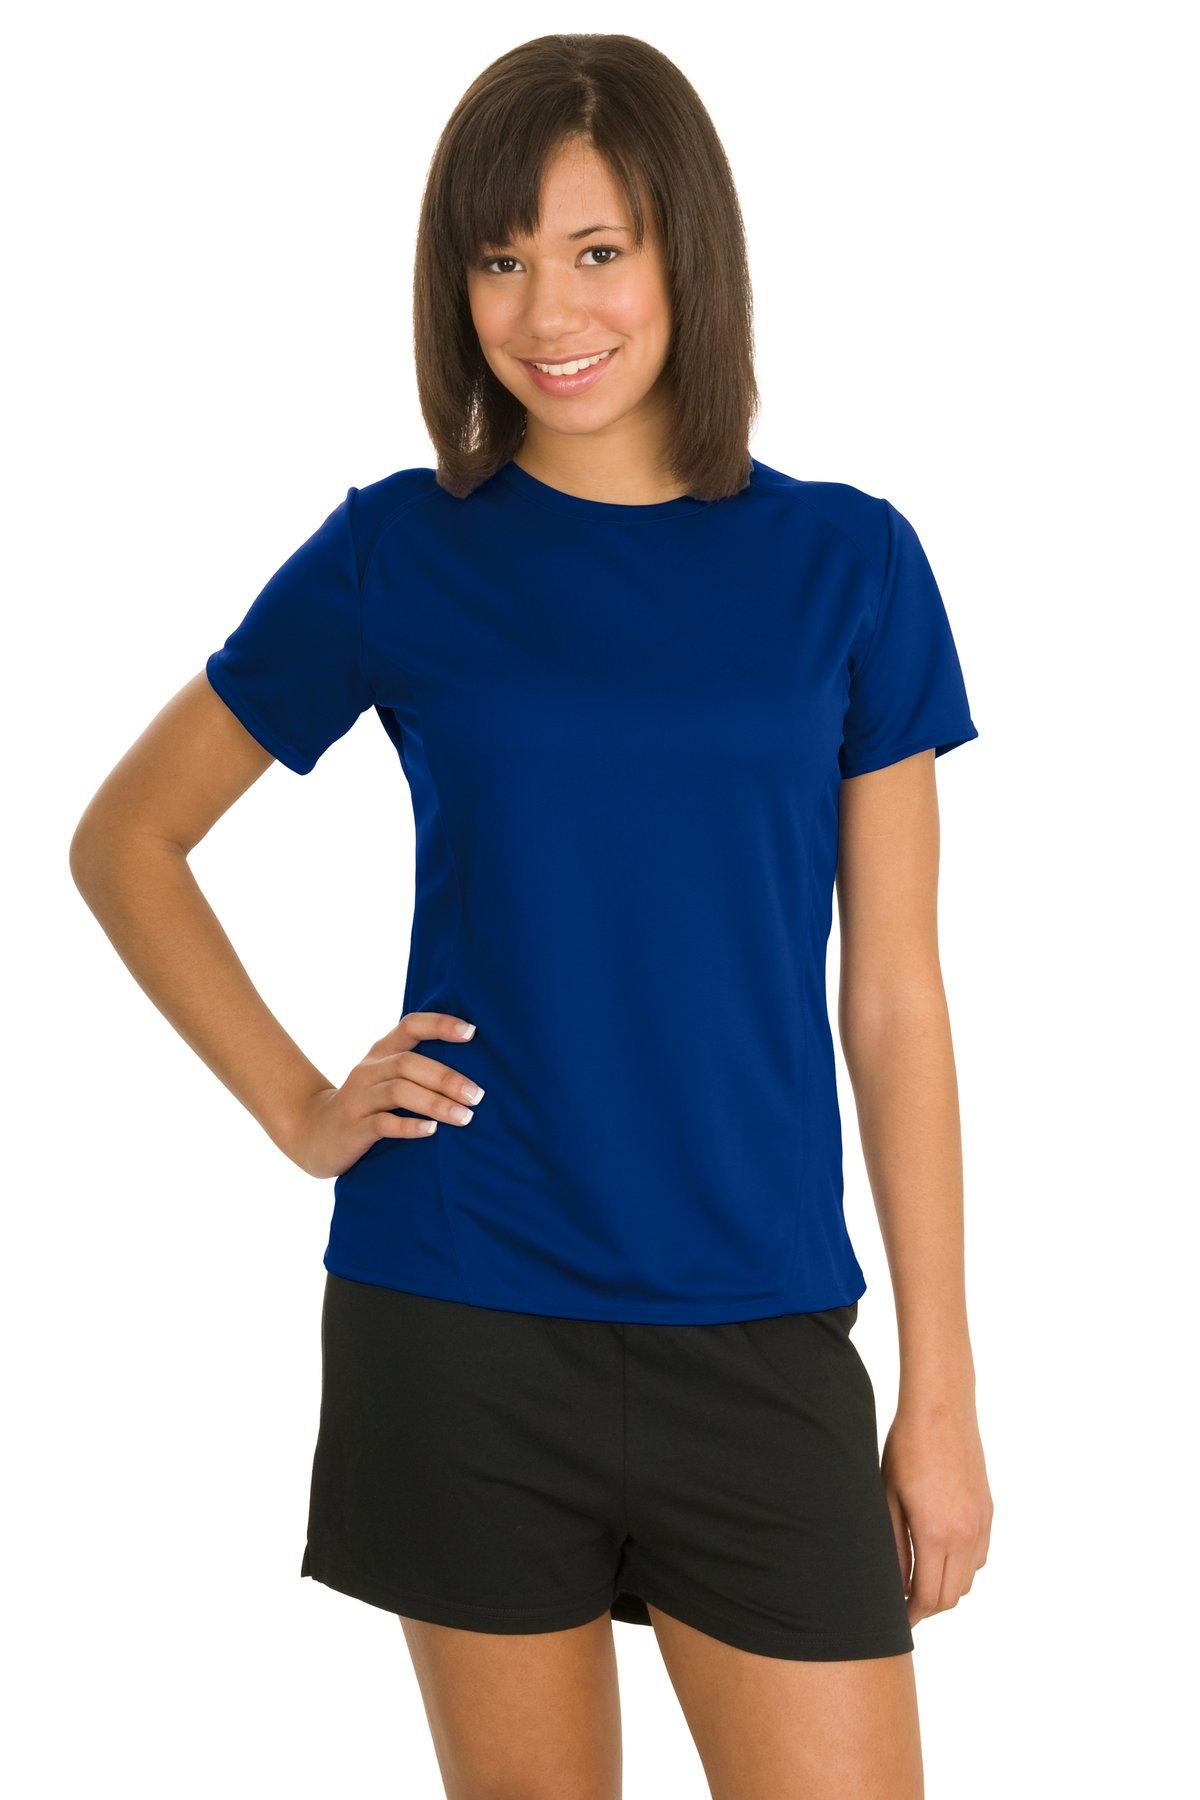 T-Shirts-Performance-10